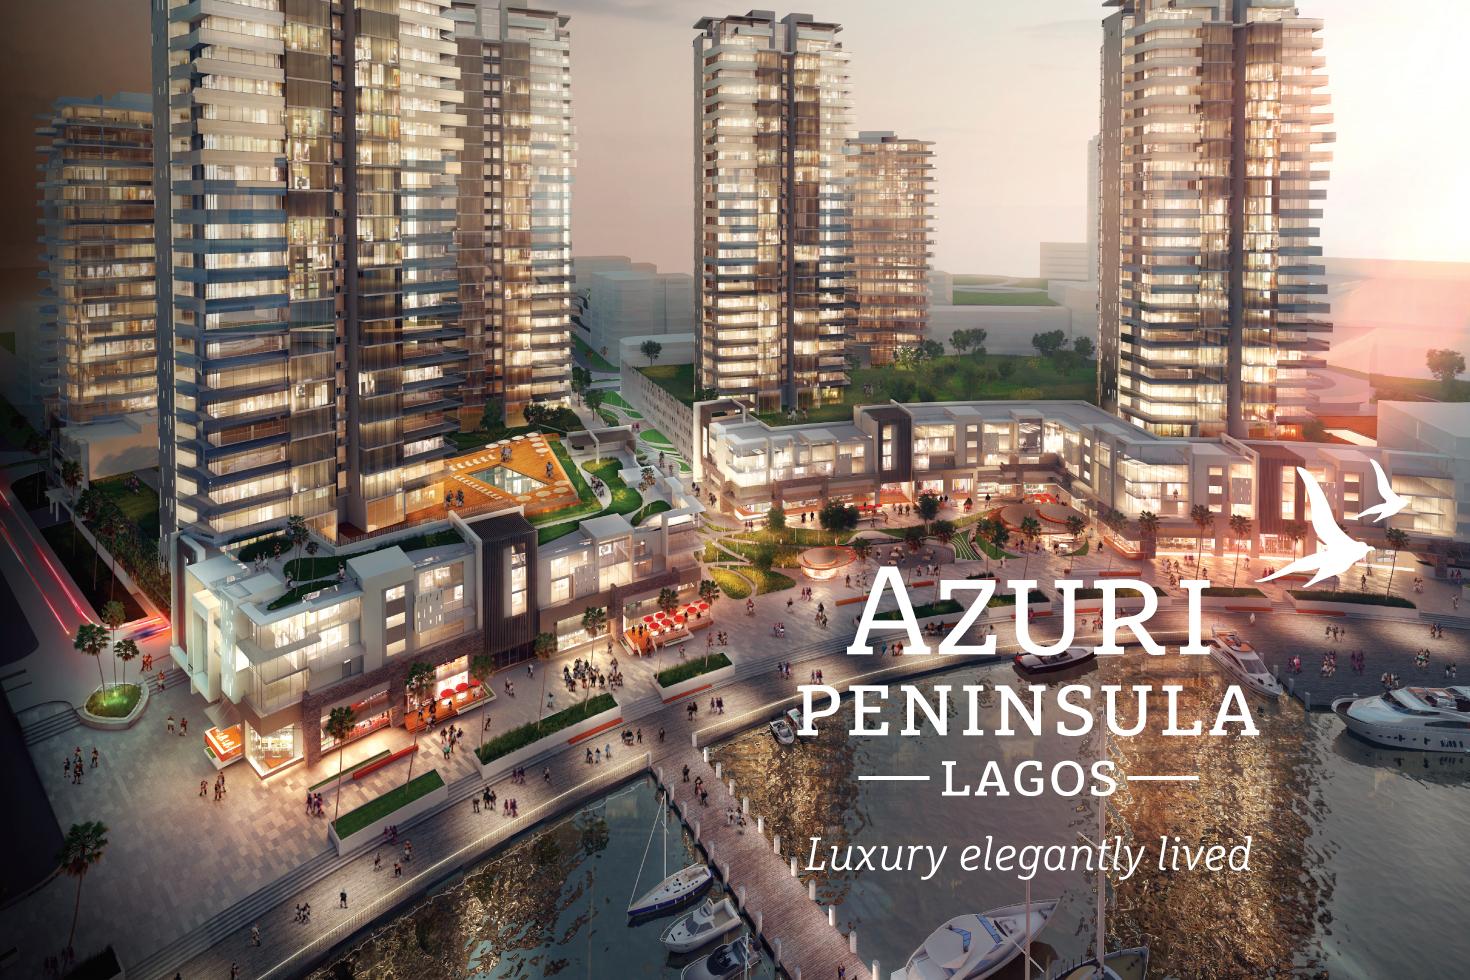 Azuri Peninsula logo